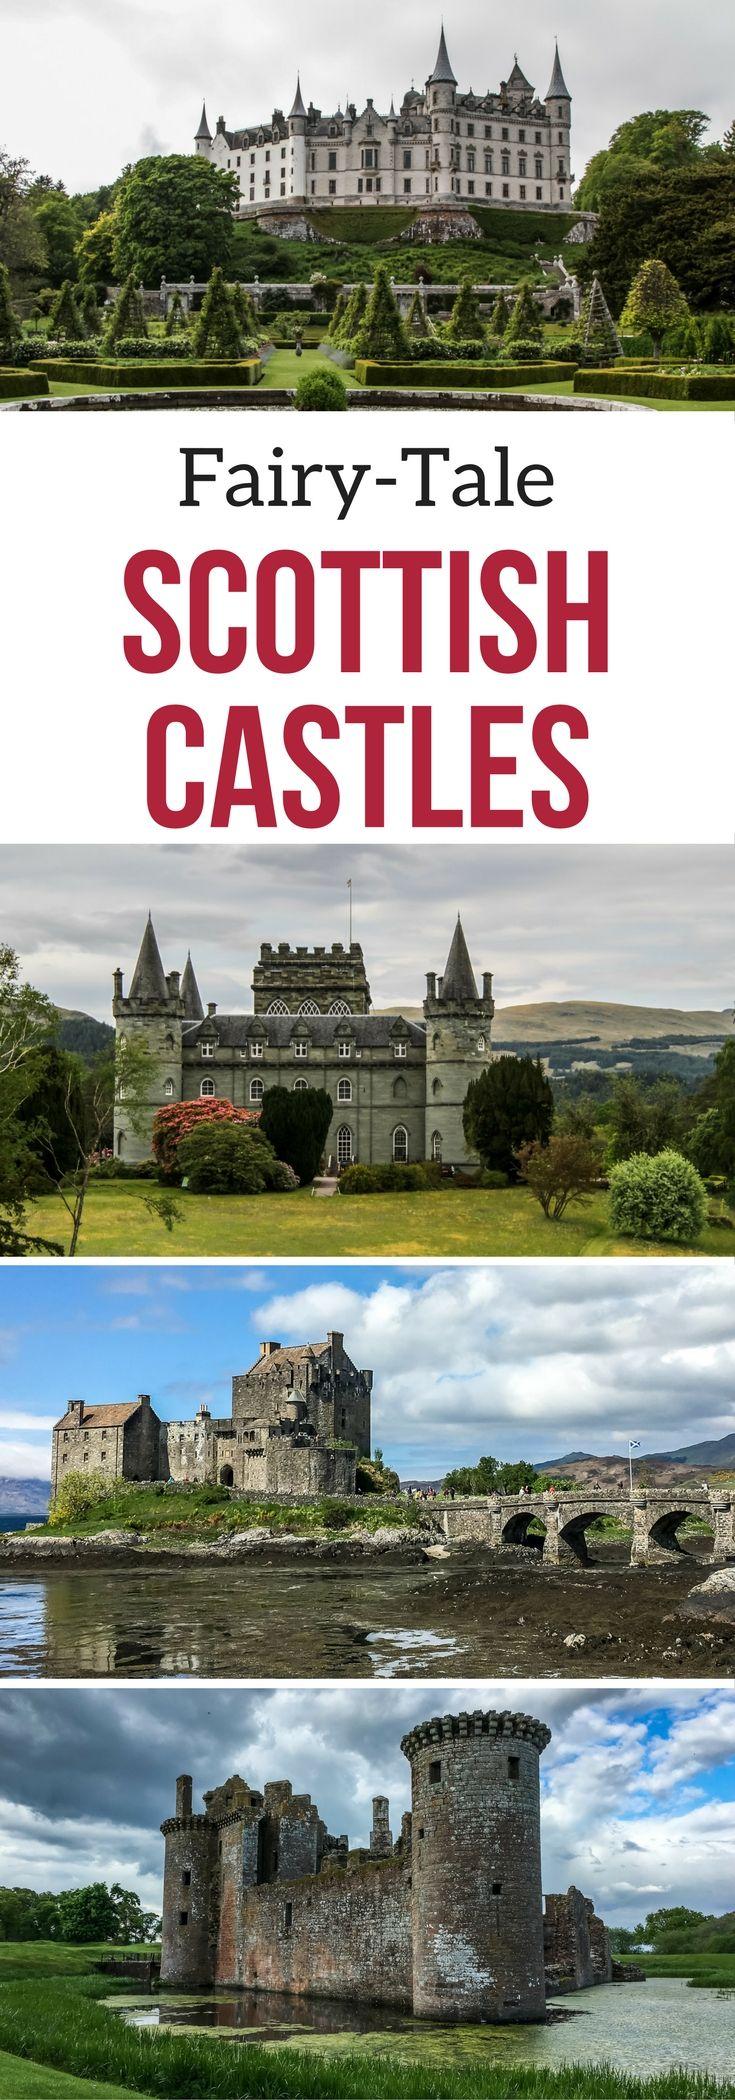 19 Best Scottish Castles (Video + Photos) – Fairytale, forts, ruins…